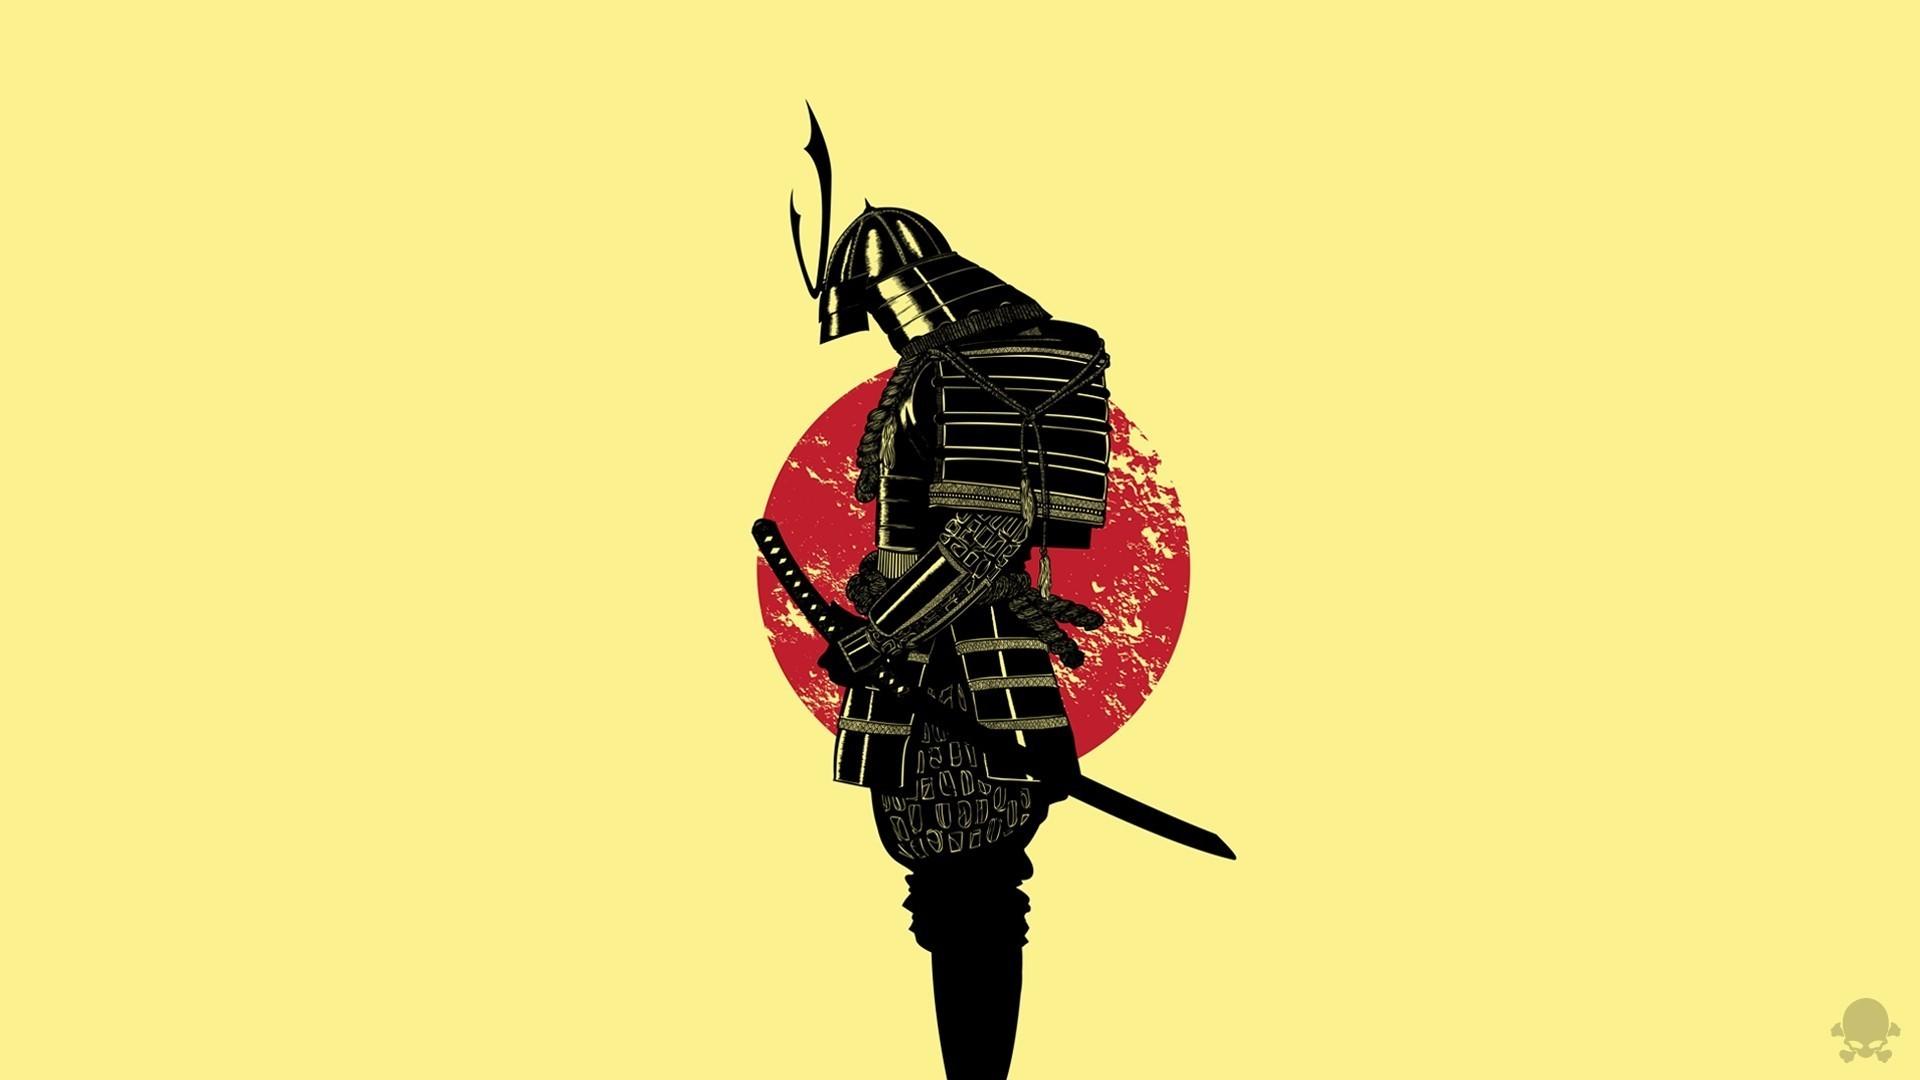 General 1920x1080 samurai warrior Japan armor minimalism artwork